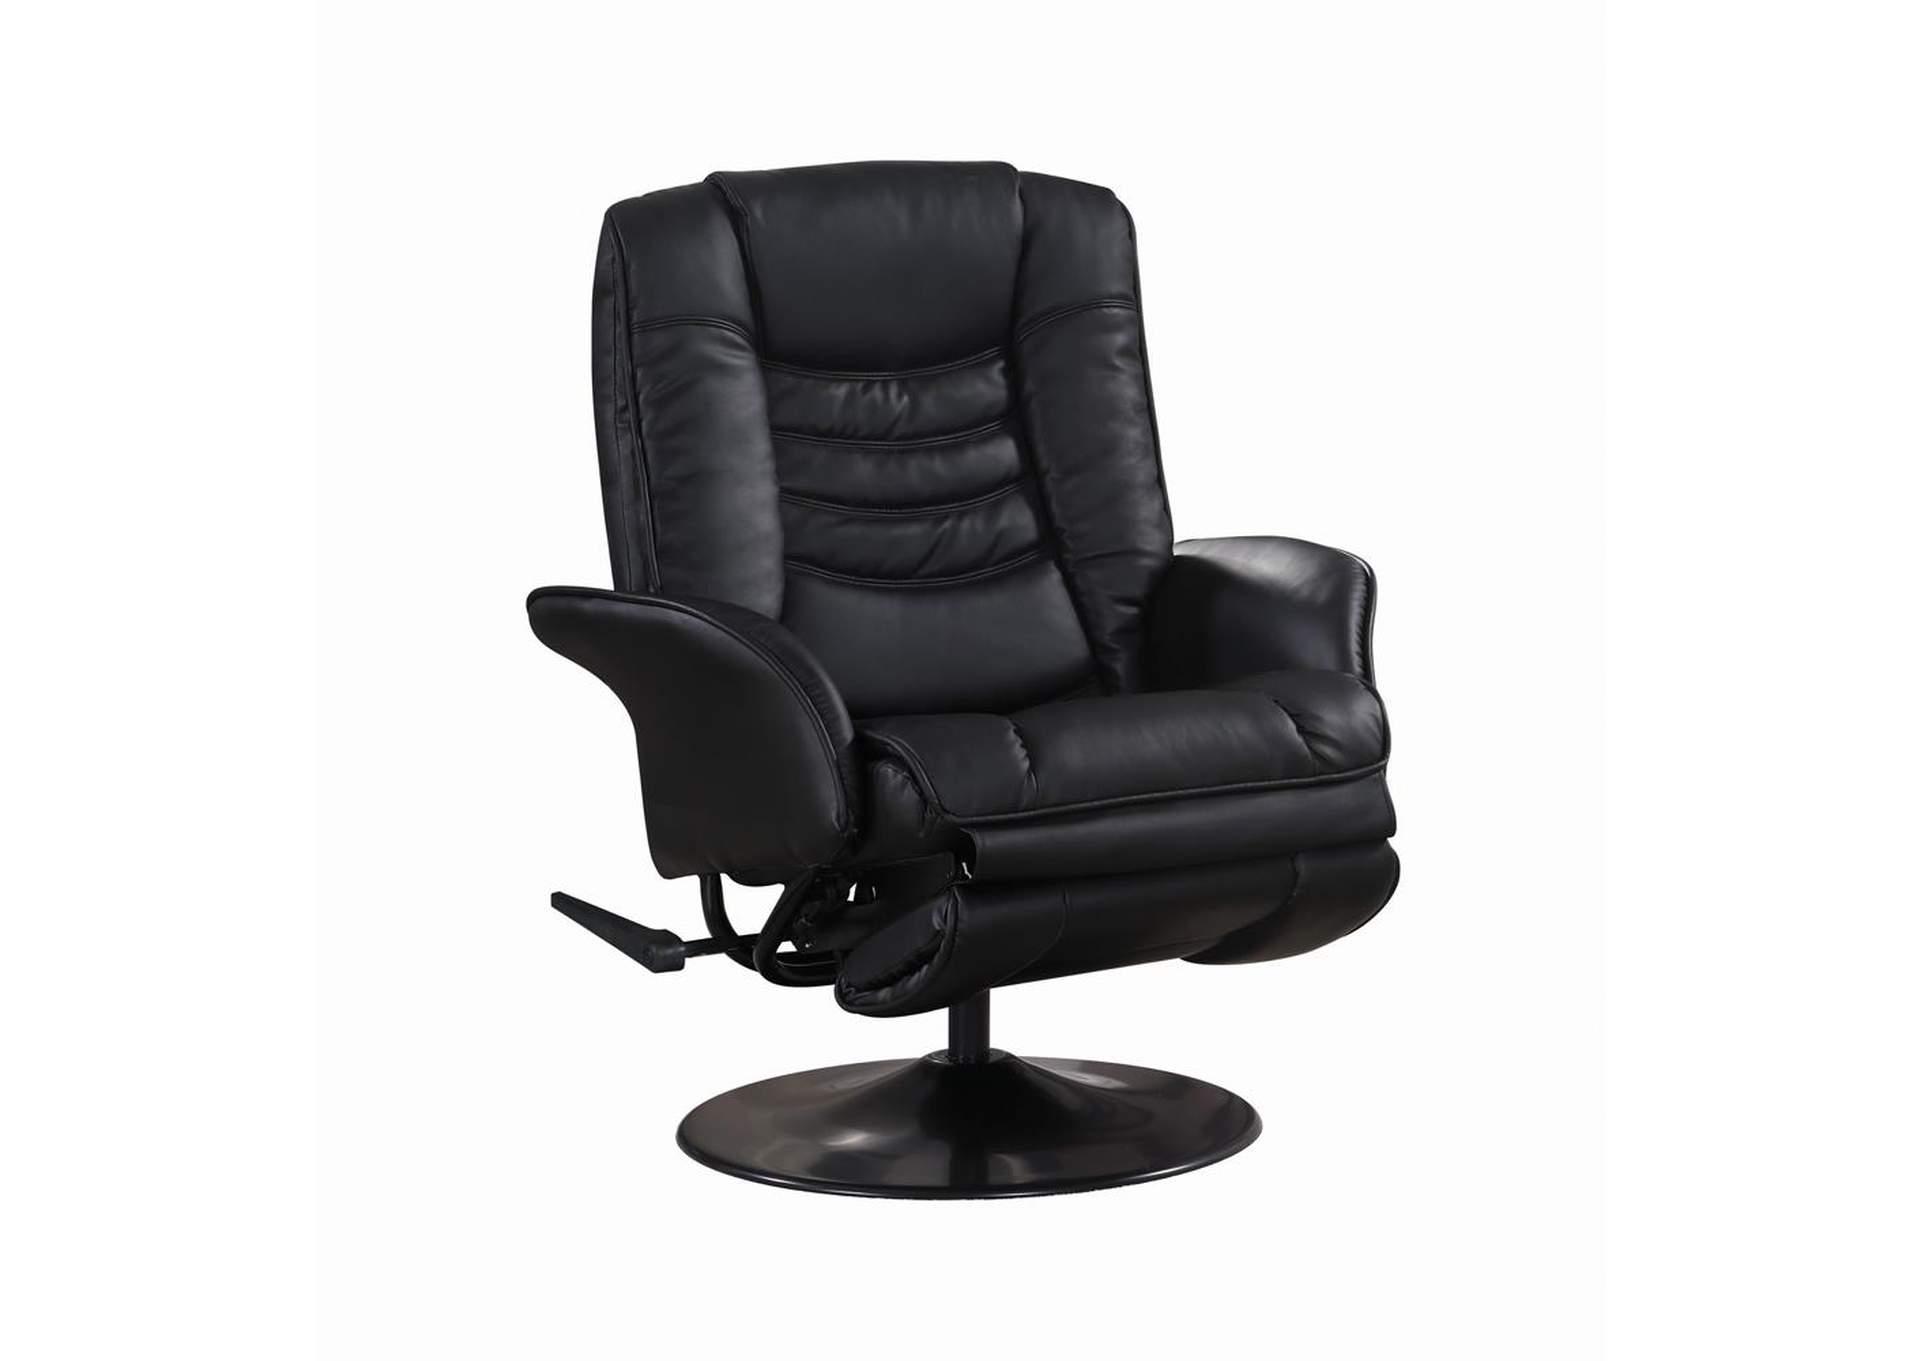 Eerie Black Casual Black Faux Leather Swivel Recliner 5th Avenue Furniture Mi